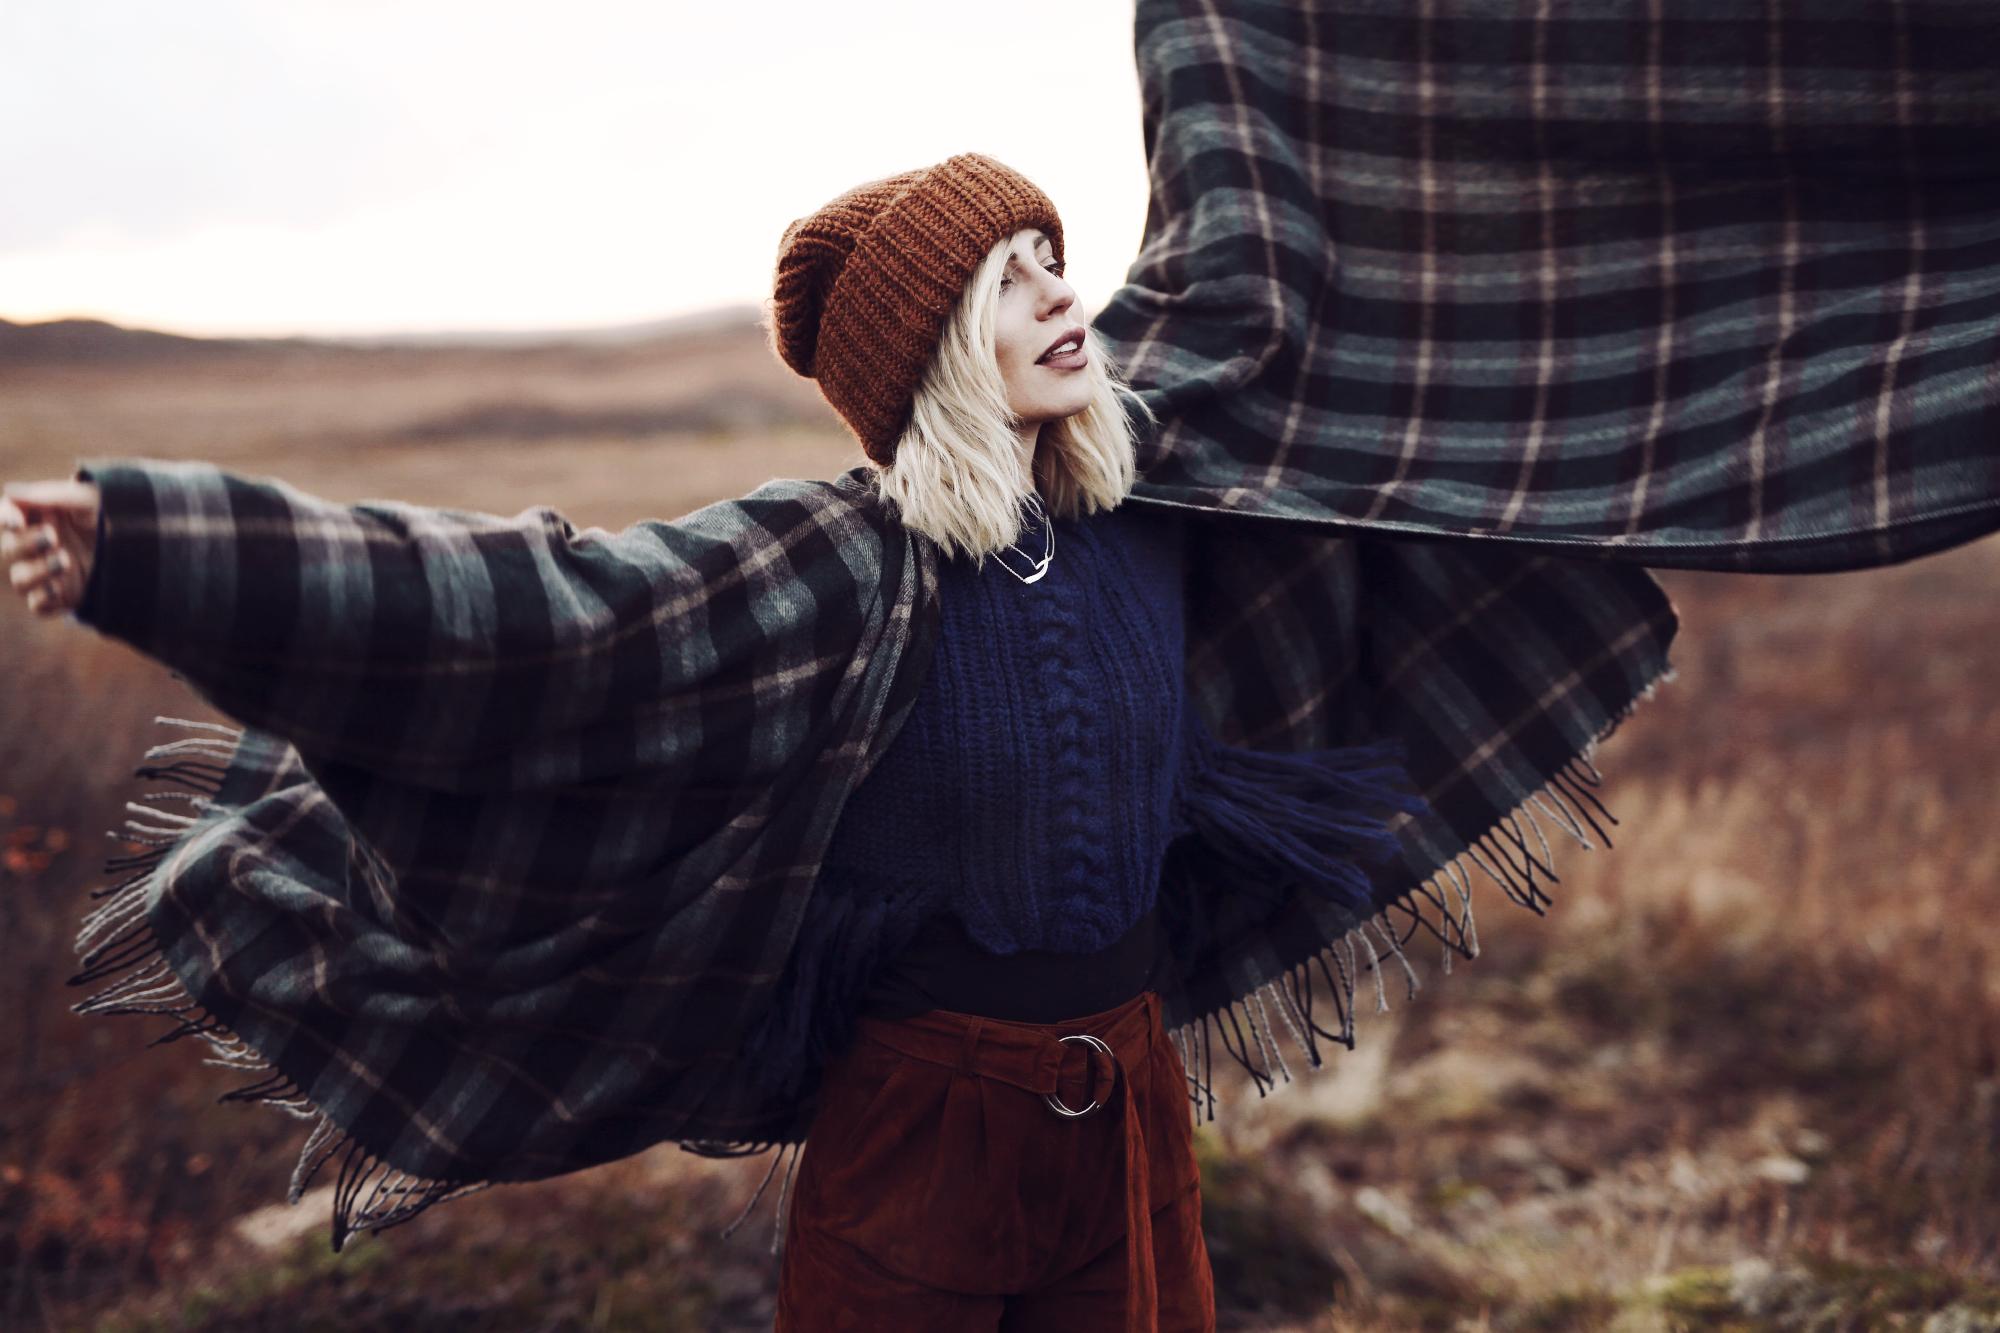 Trachtenmode modern interpretiert | Bergsteiger | style: german, folkloric, modern, stylish, traditional, nature, autumn, checked